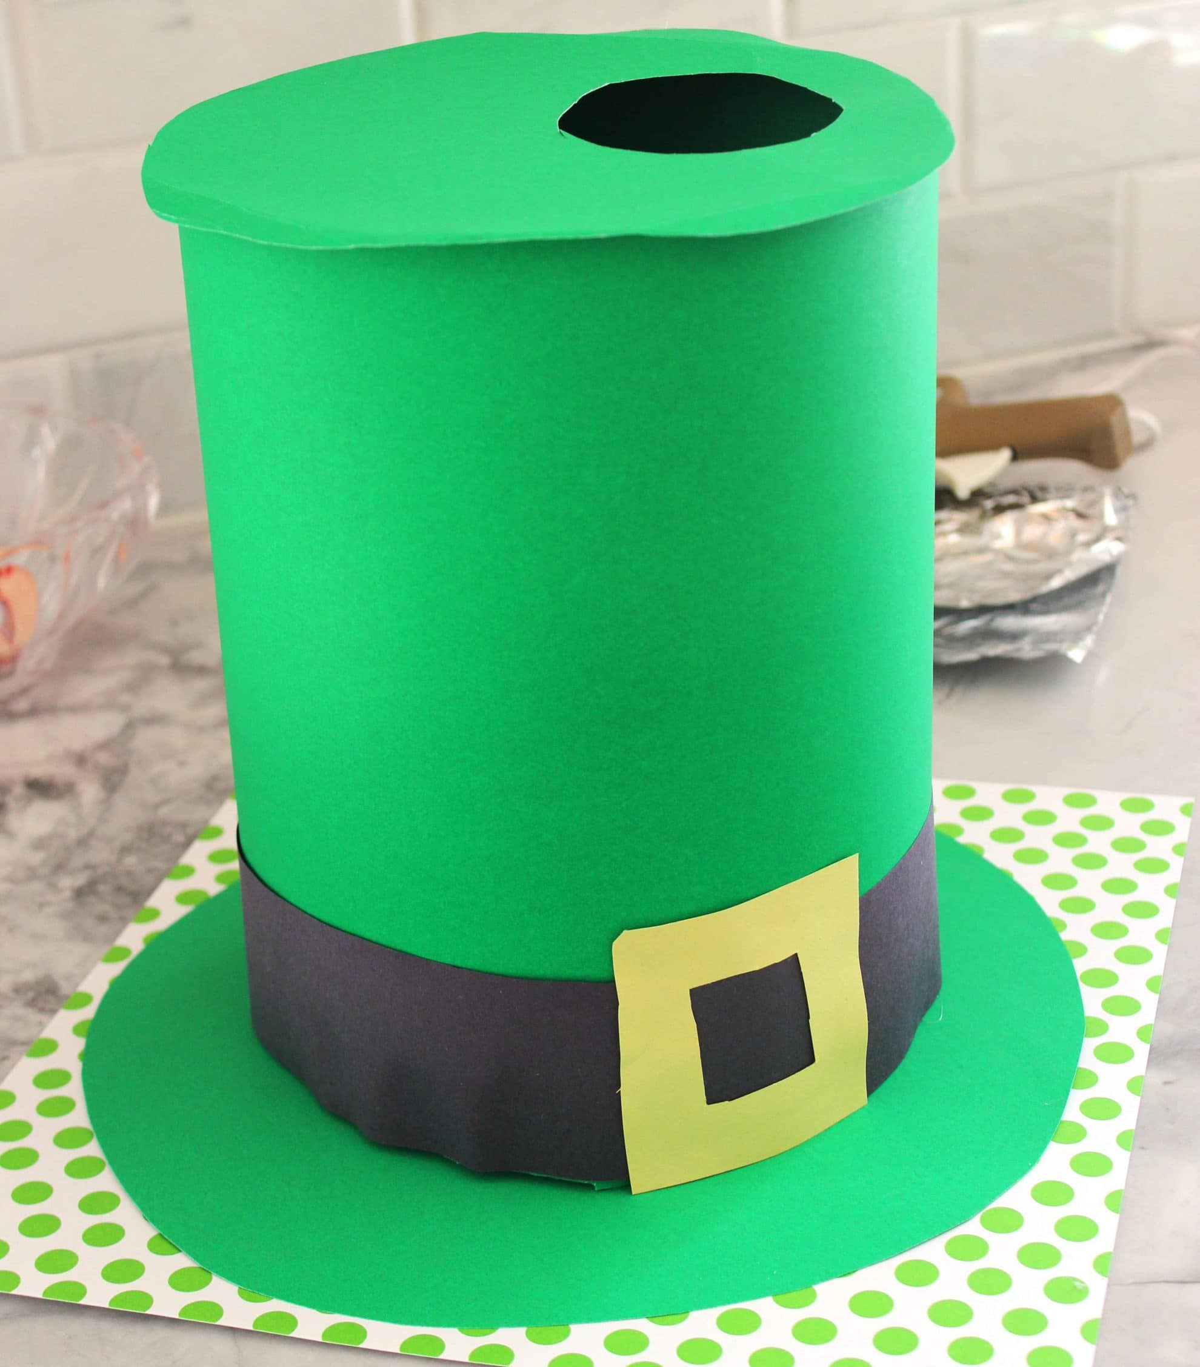 How to Build a Leprechaun Trap - The Suburban Soapbox